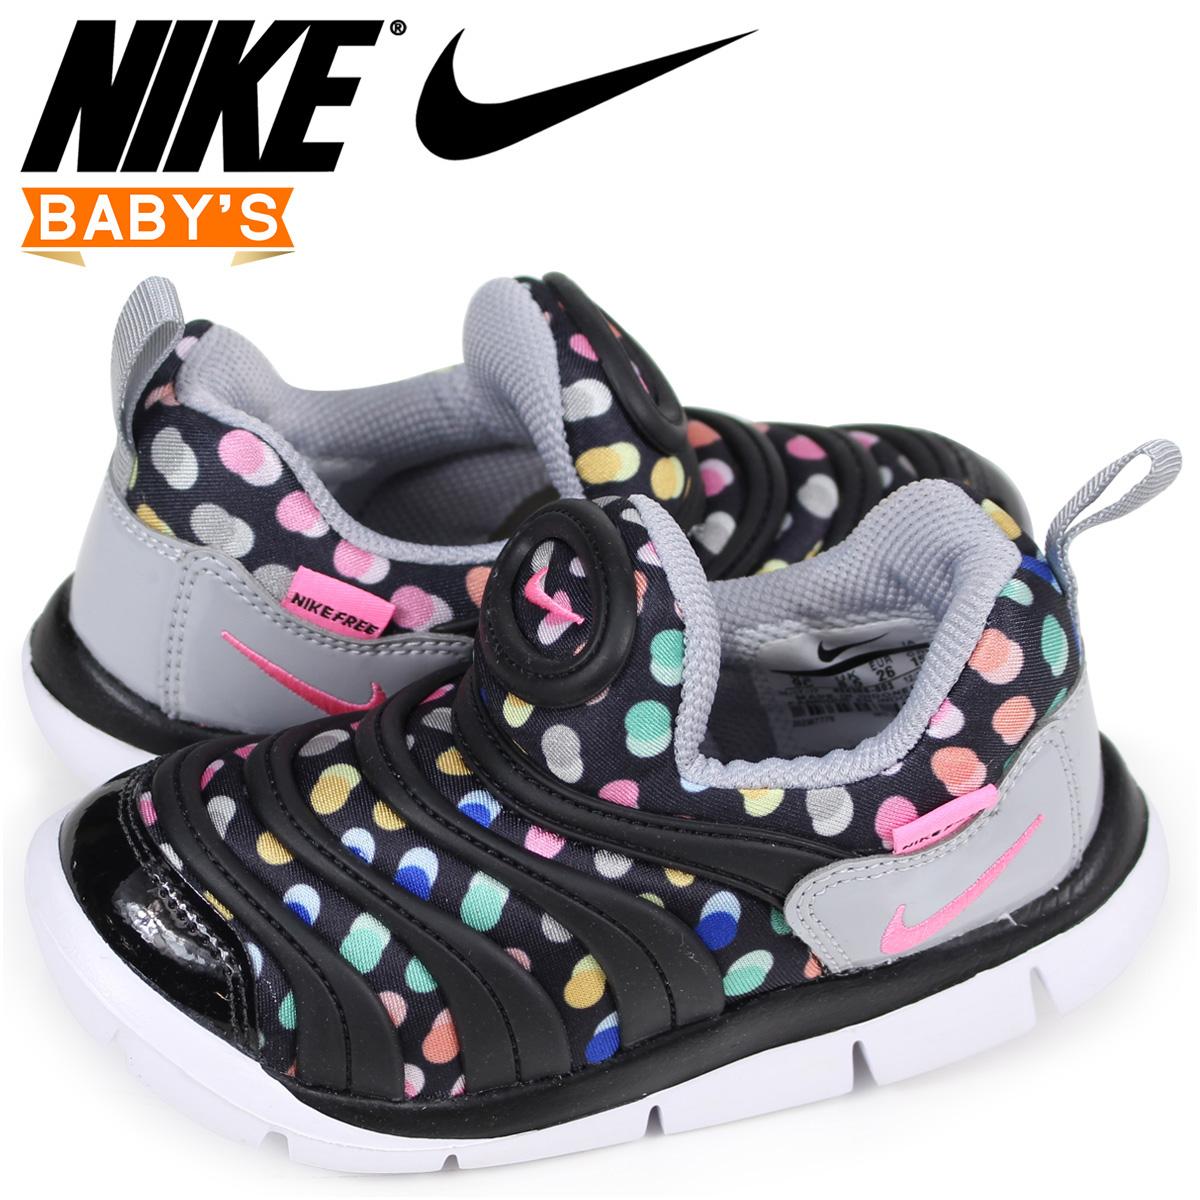 sneak online shop nike nike dynamo free baby sneakers dynamo free print td 834 366 003 black. Black Bedroom Furniture Sets. Home Design Ideas